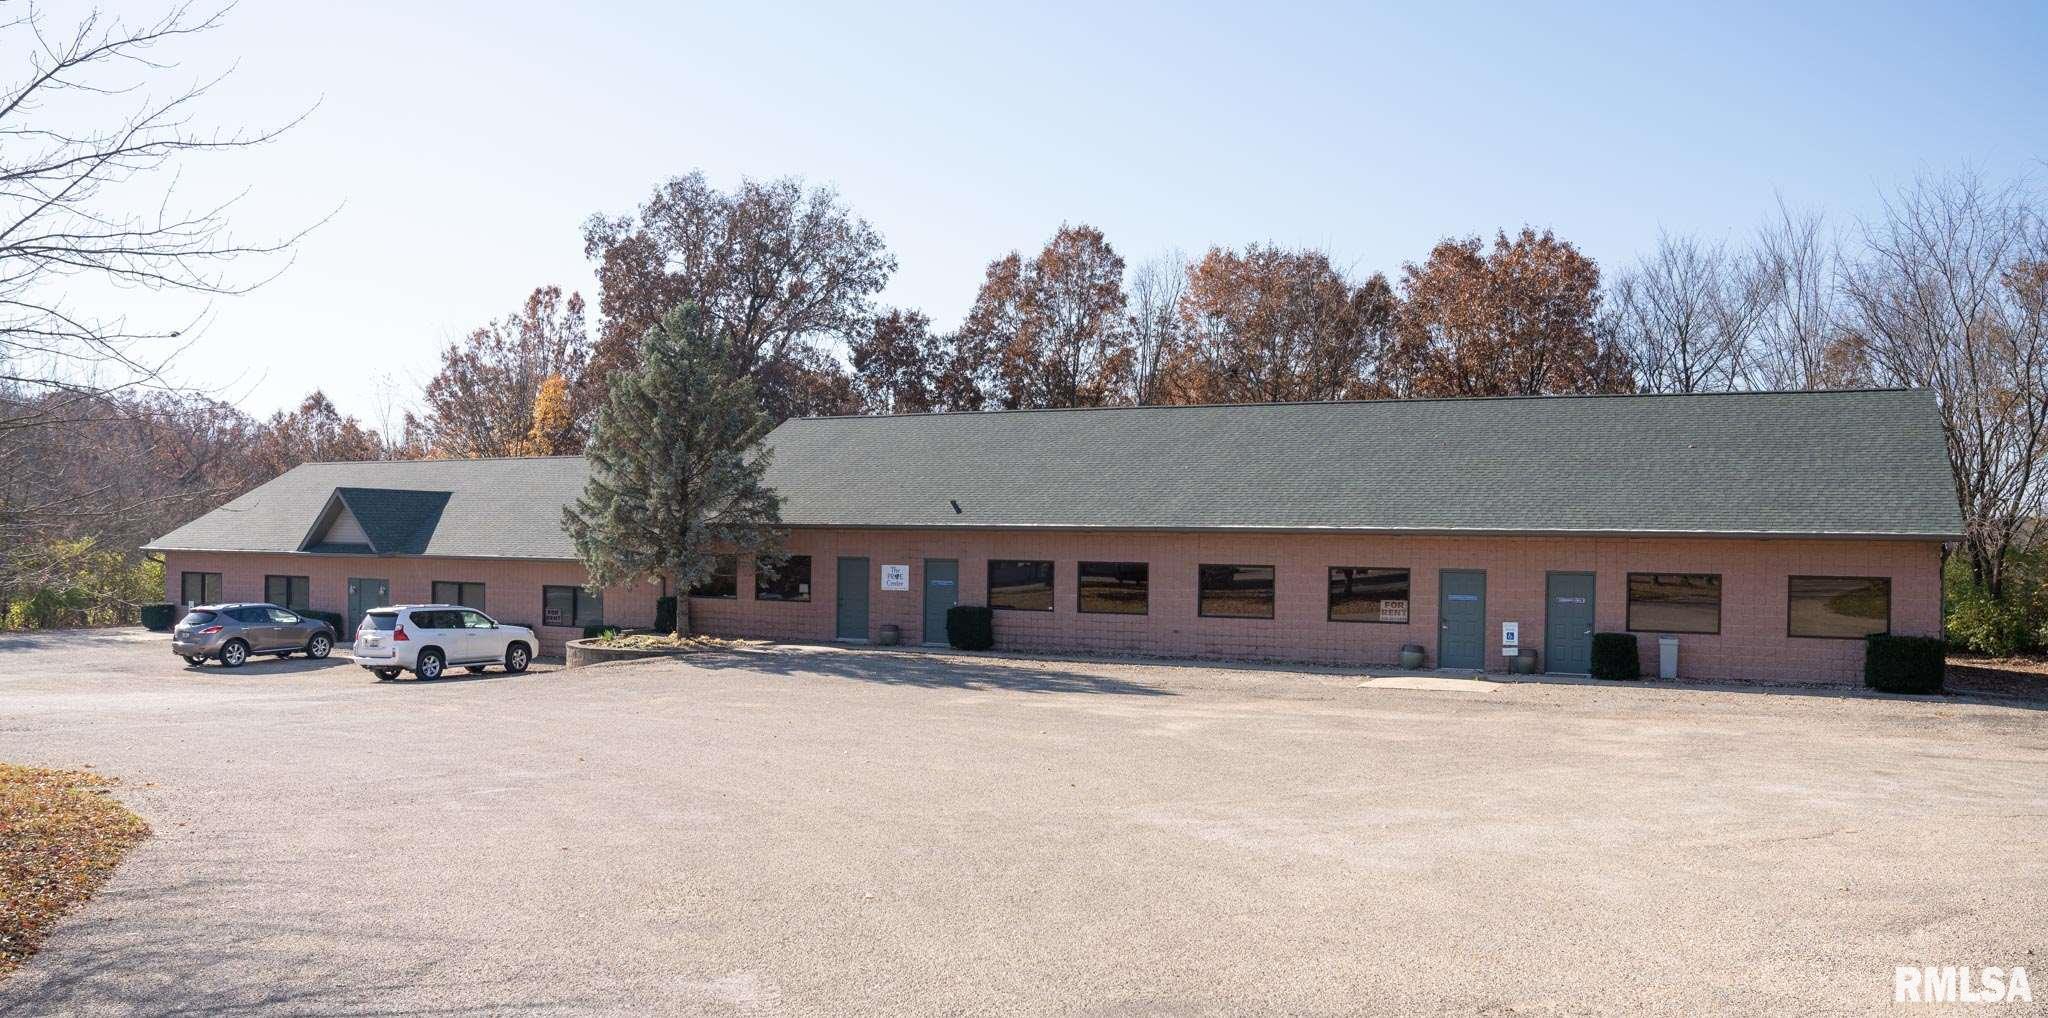 10112 DUBOIS Property Photo - Edwards, IL real estate listing